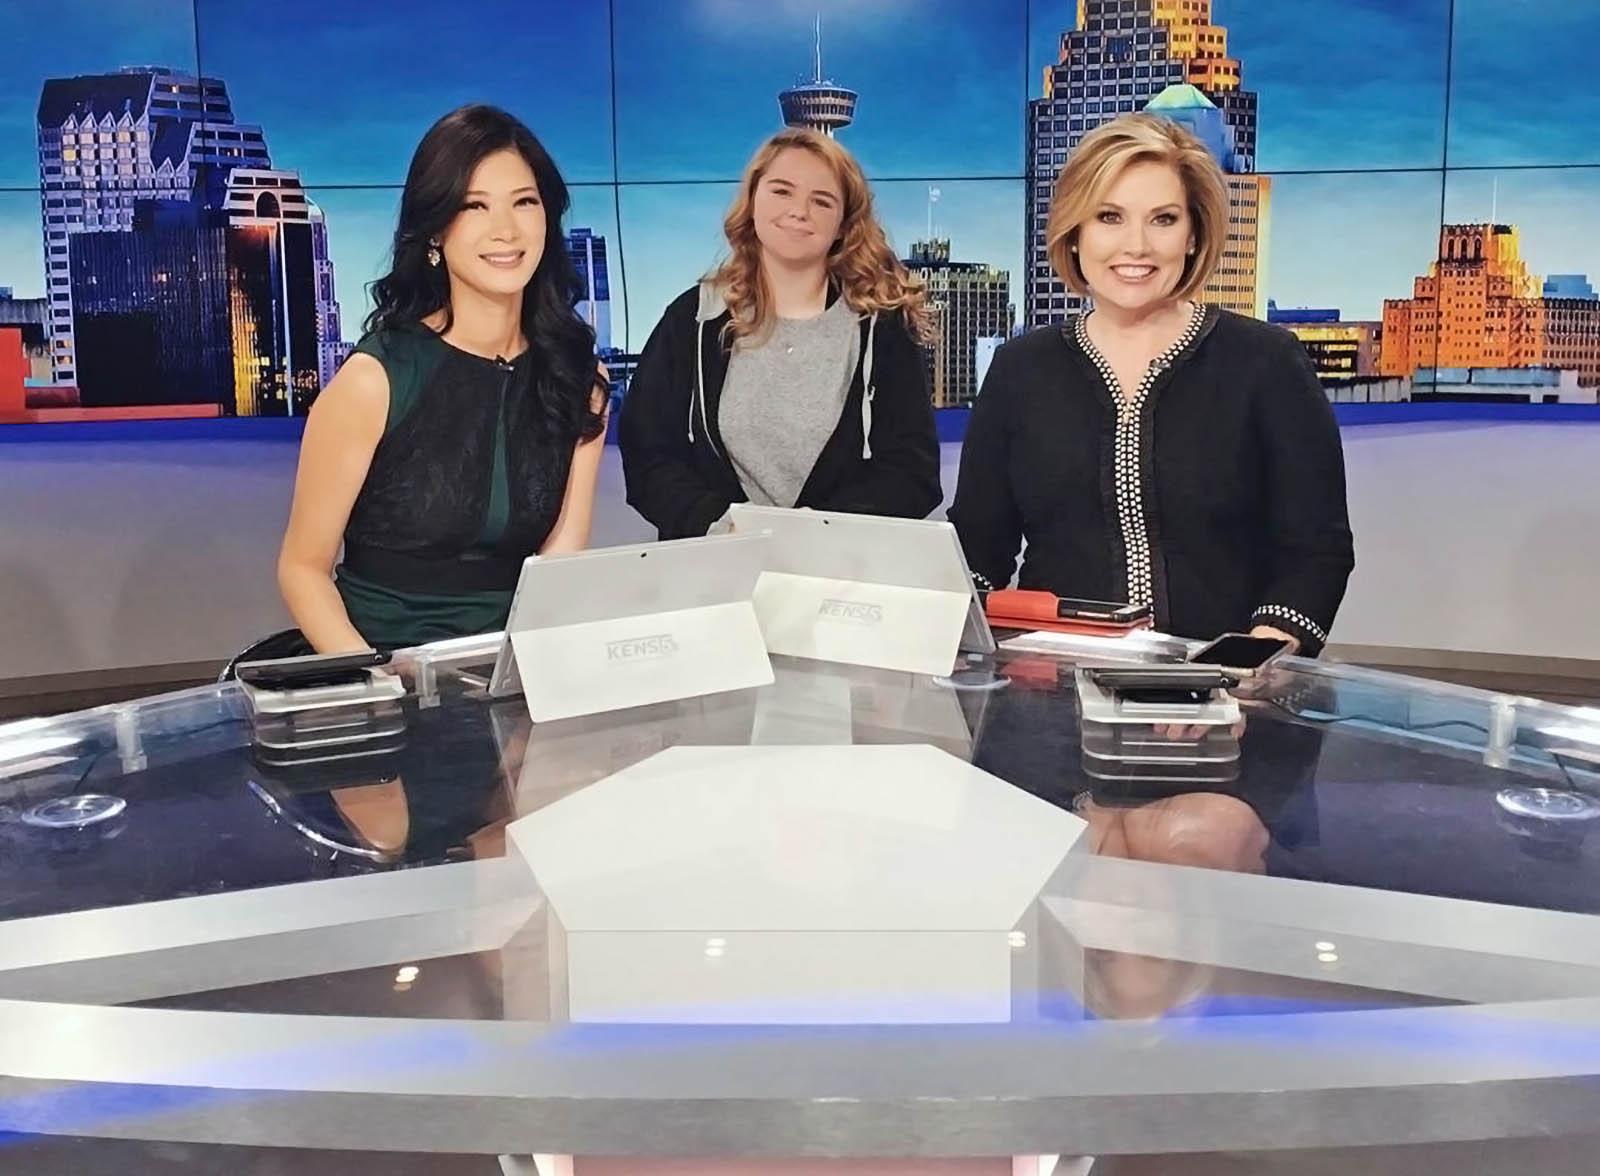 KENS 5 News San Antonio newscasters